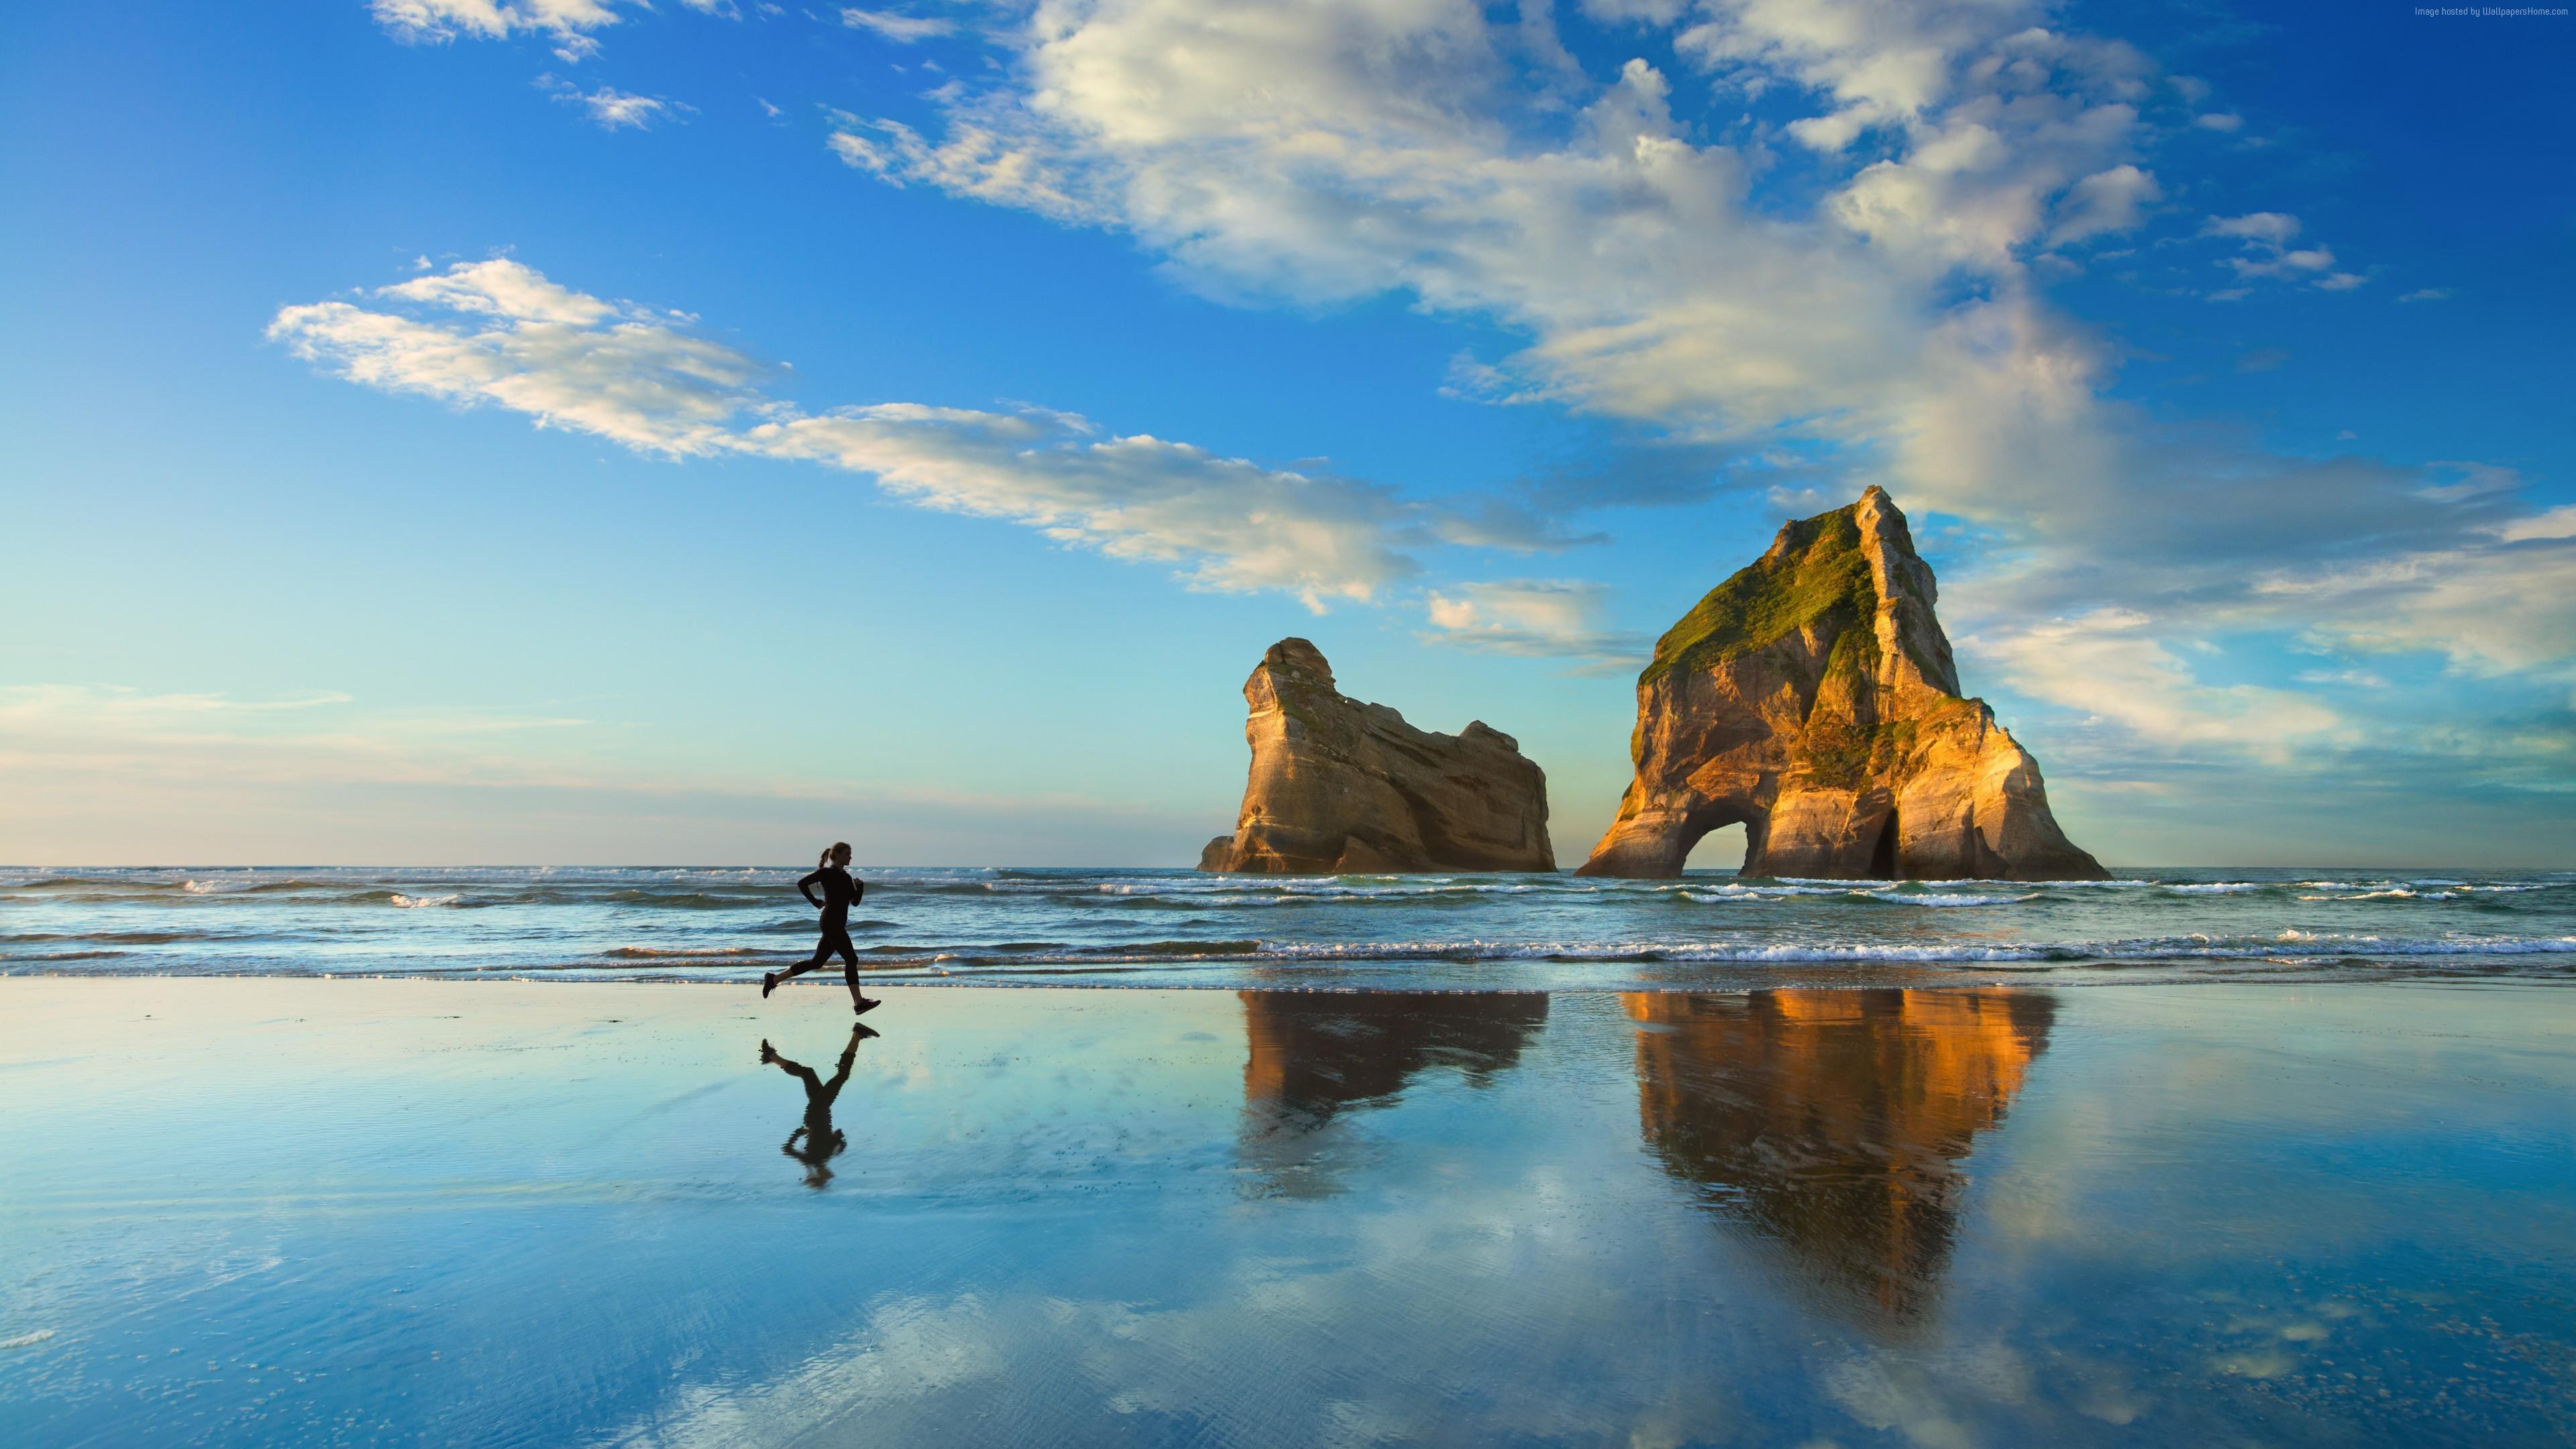 Windows 10 4k Wallpaper Microsoft Blue Sea Woman Running